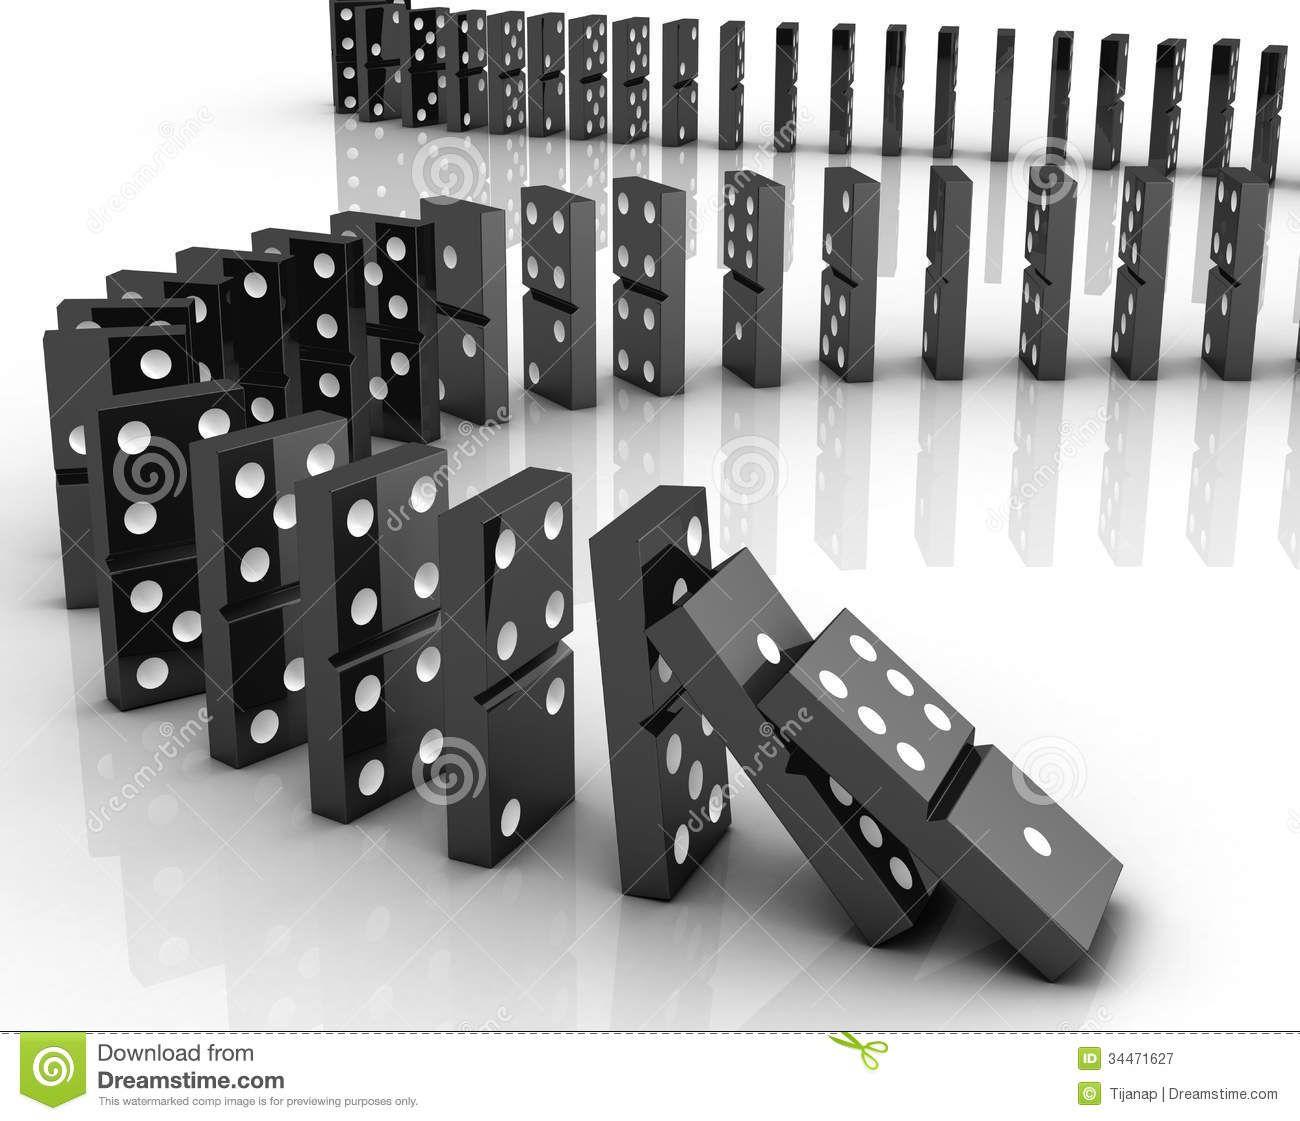 When Dominoes Fall Karma - Video dominoes falling reverse simply mesmerizing